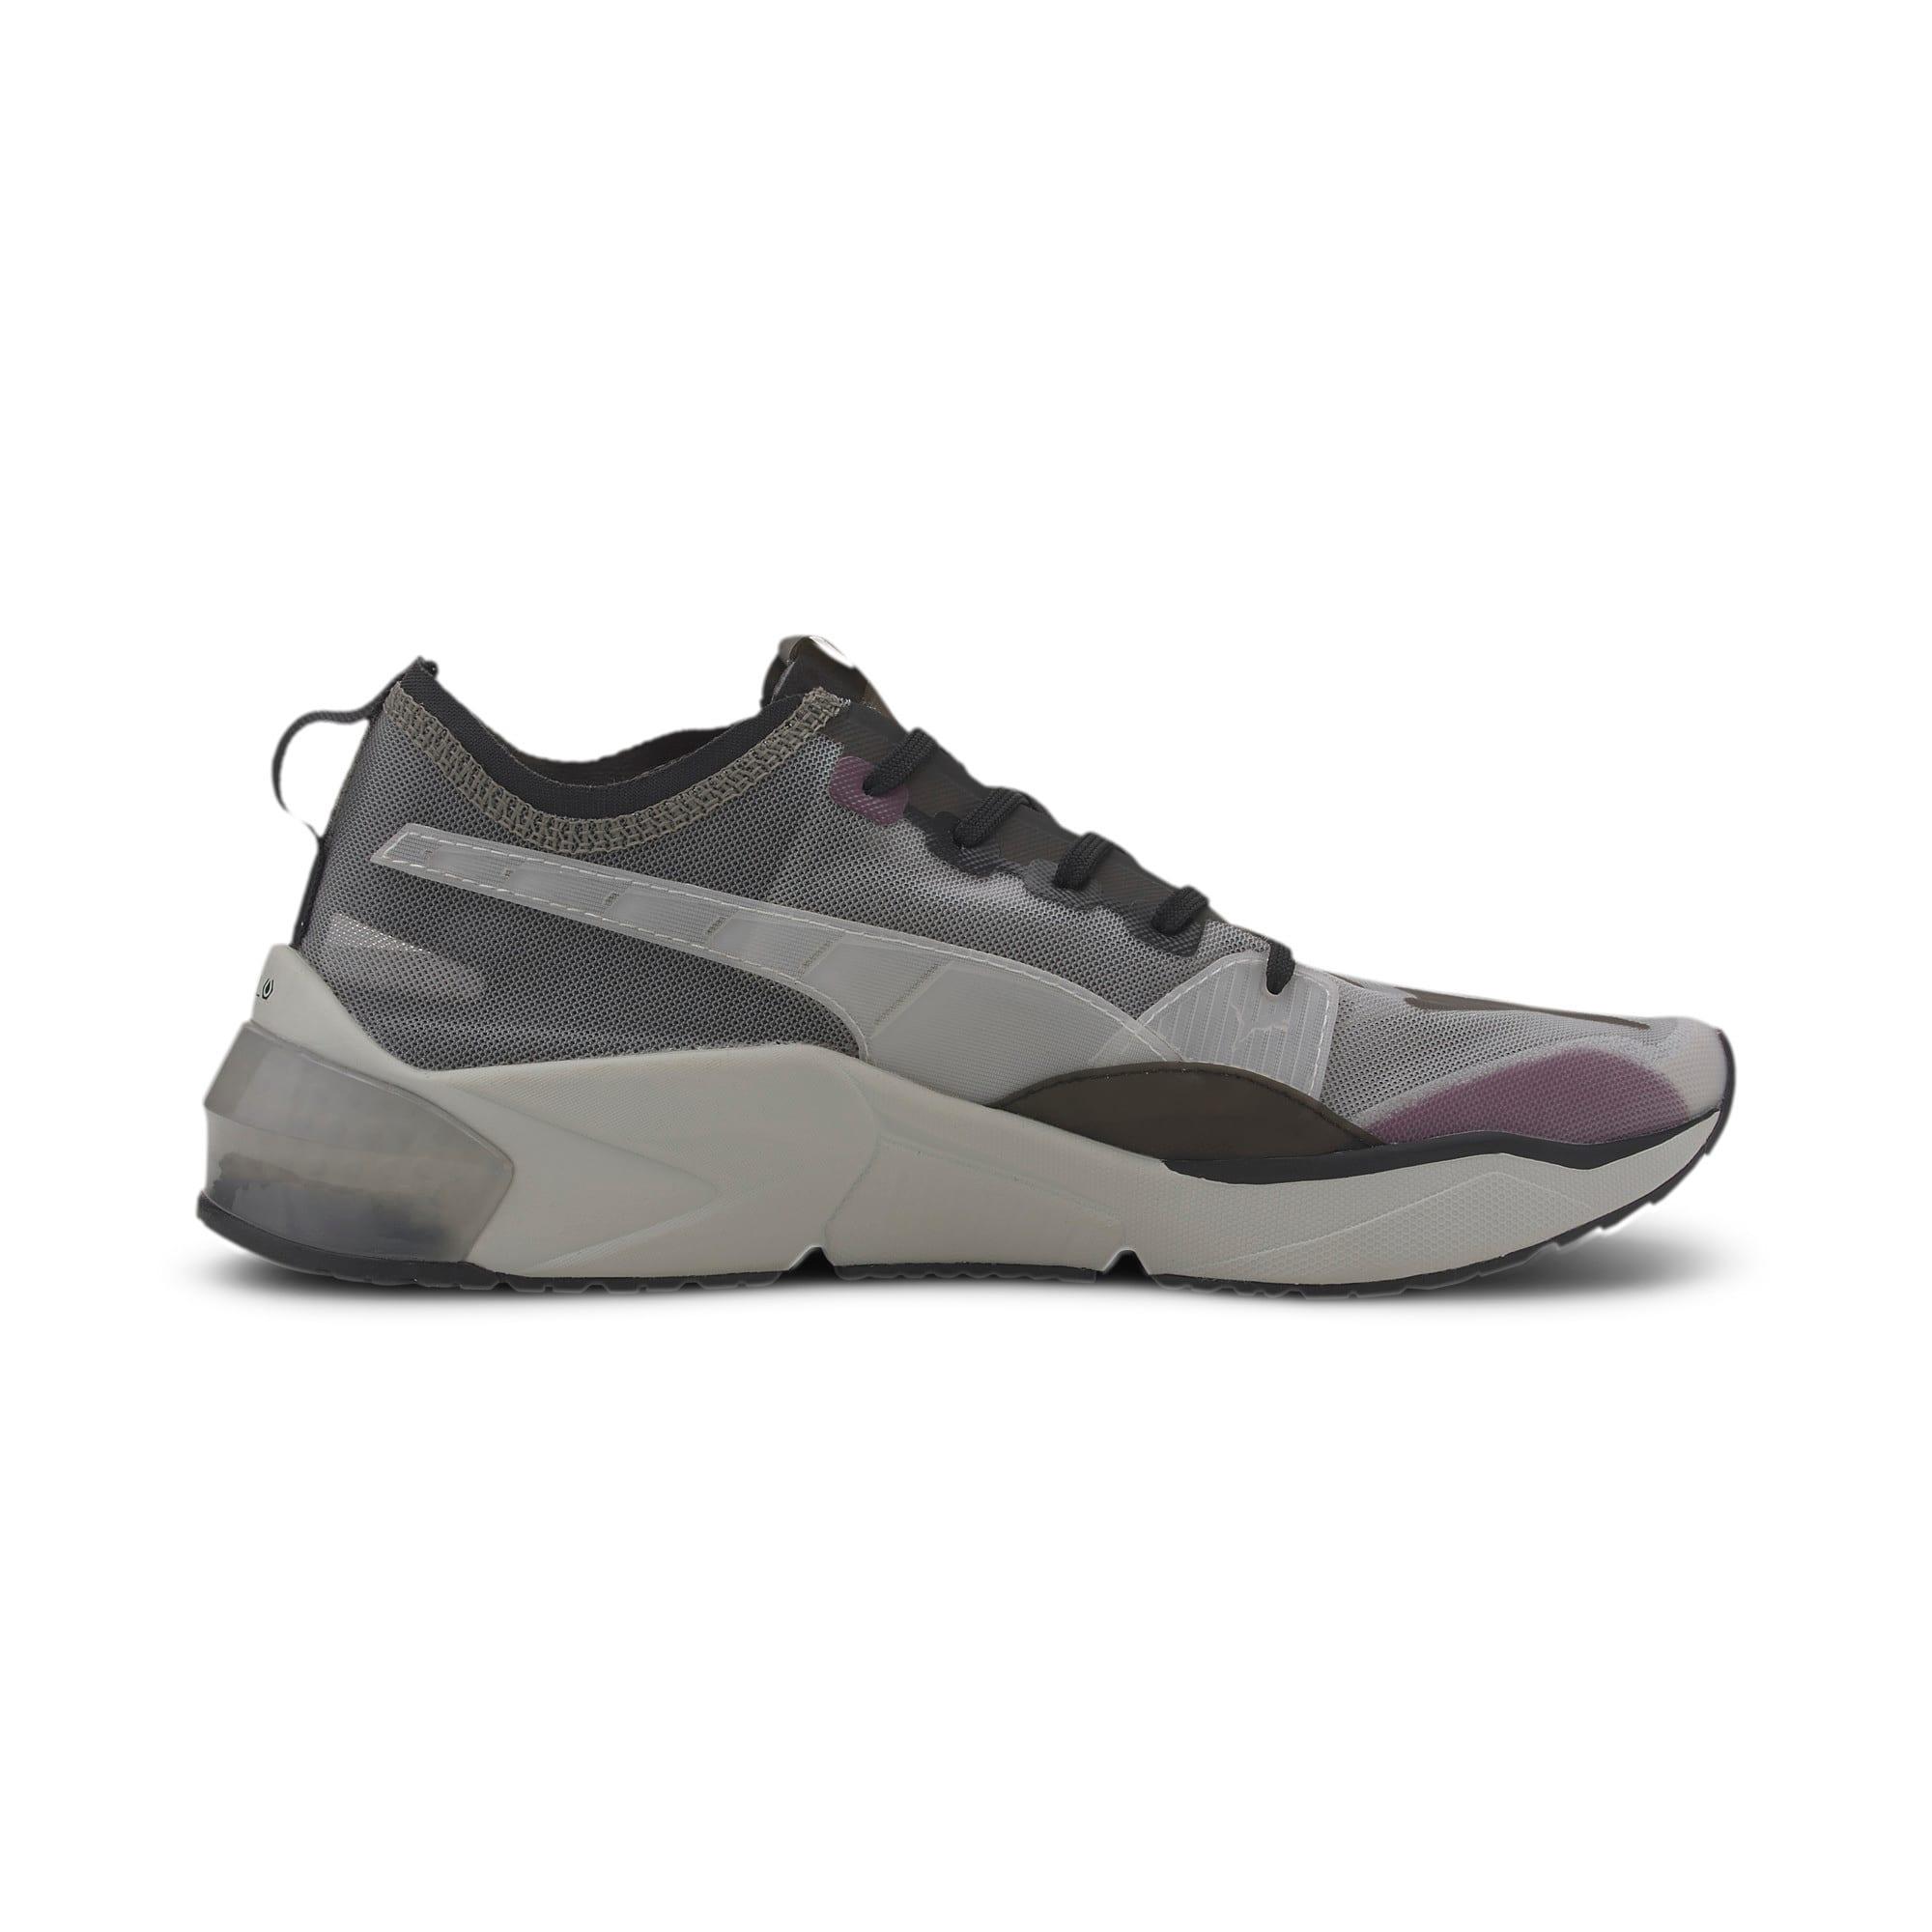 Thumbnail 5 of LQDCELL Optic Sheer Men's Training Shoes, Gray Violet-Puma Black, medium